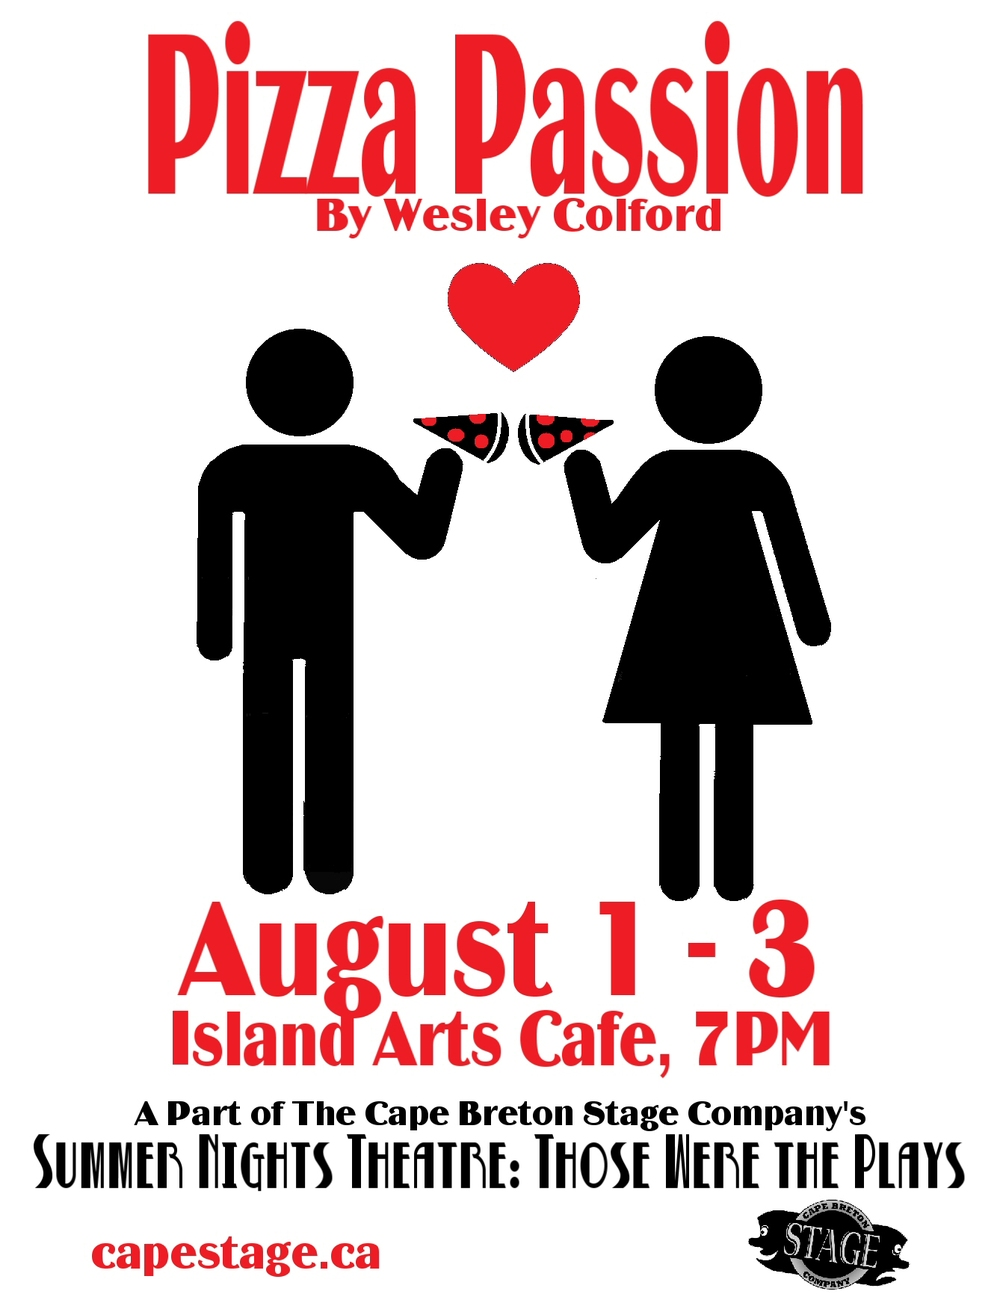 pizzapassionposter1.jpg